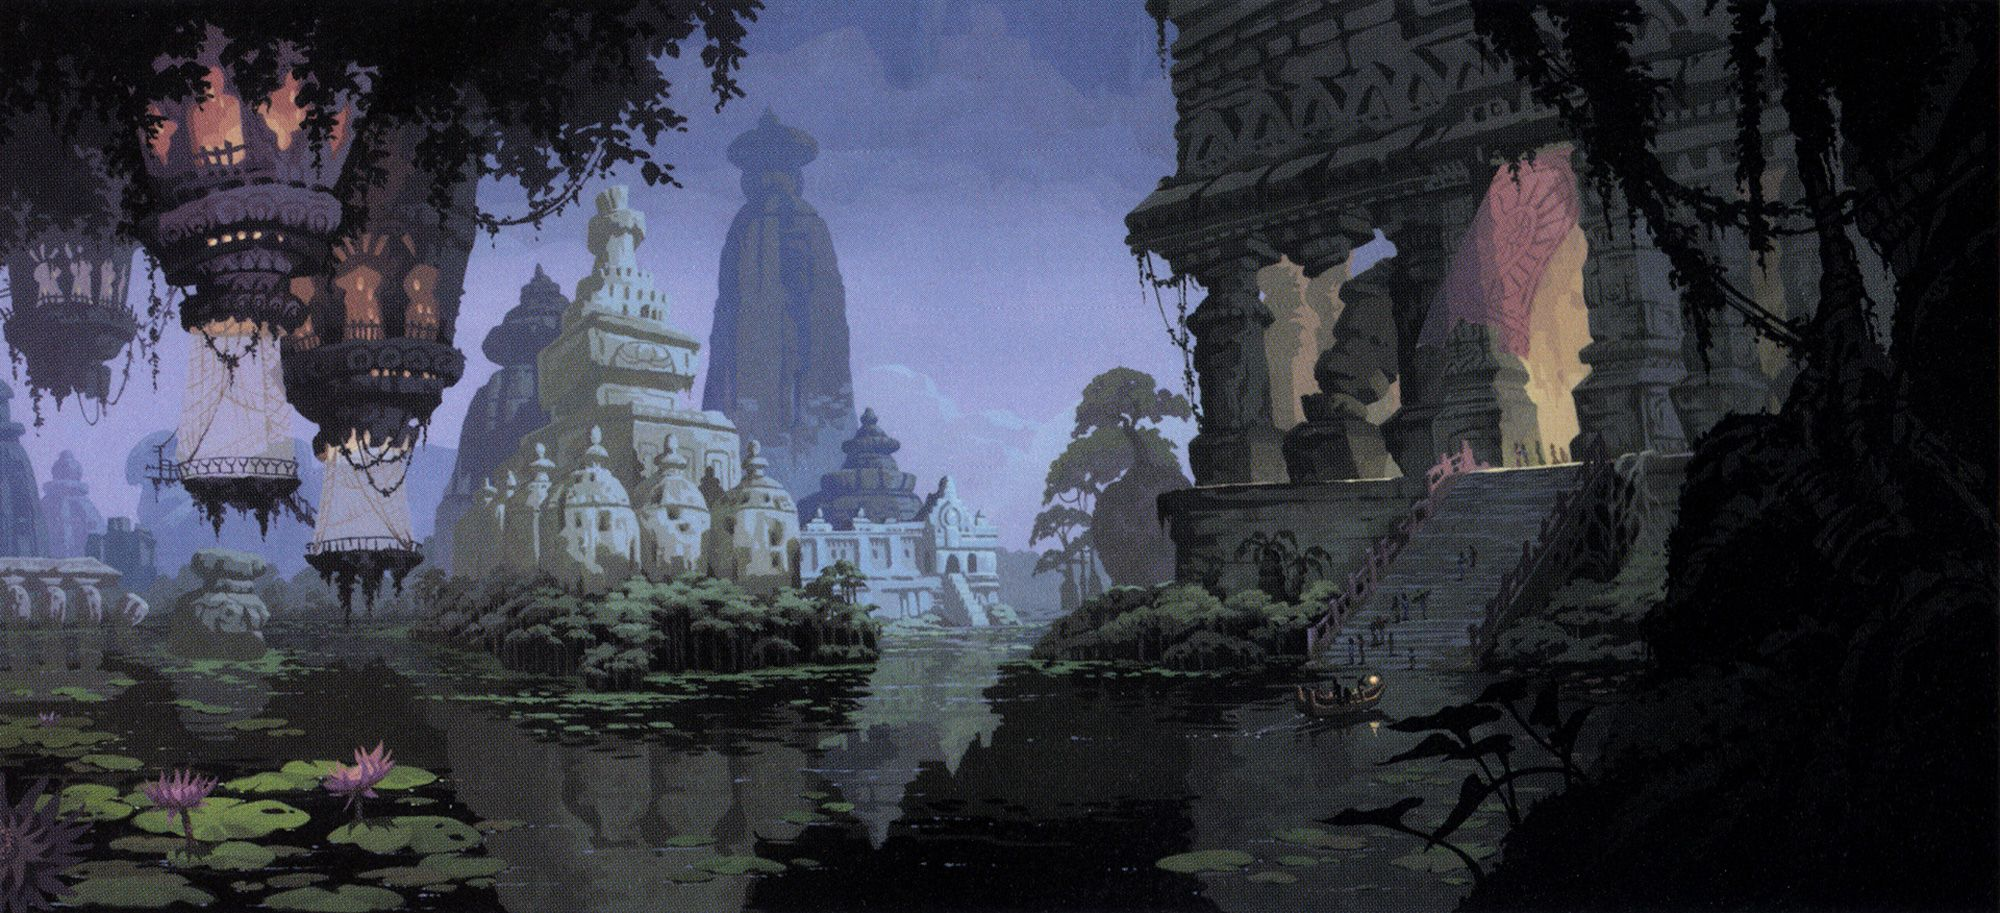 Atlantide, l'Empire Perdu [Walt Disney - 2001] - Page 7 9ba0a7b377d8c071b0eb0f9a8f2209f1